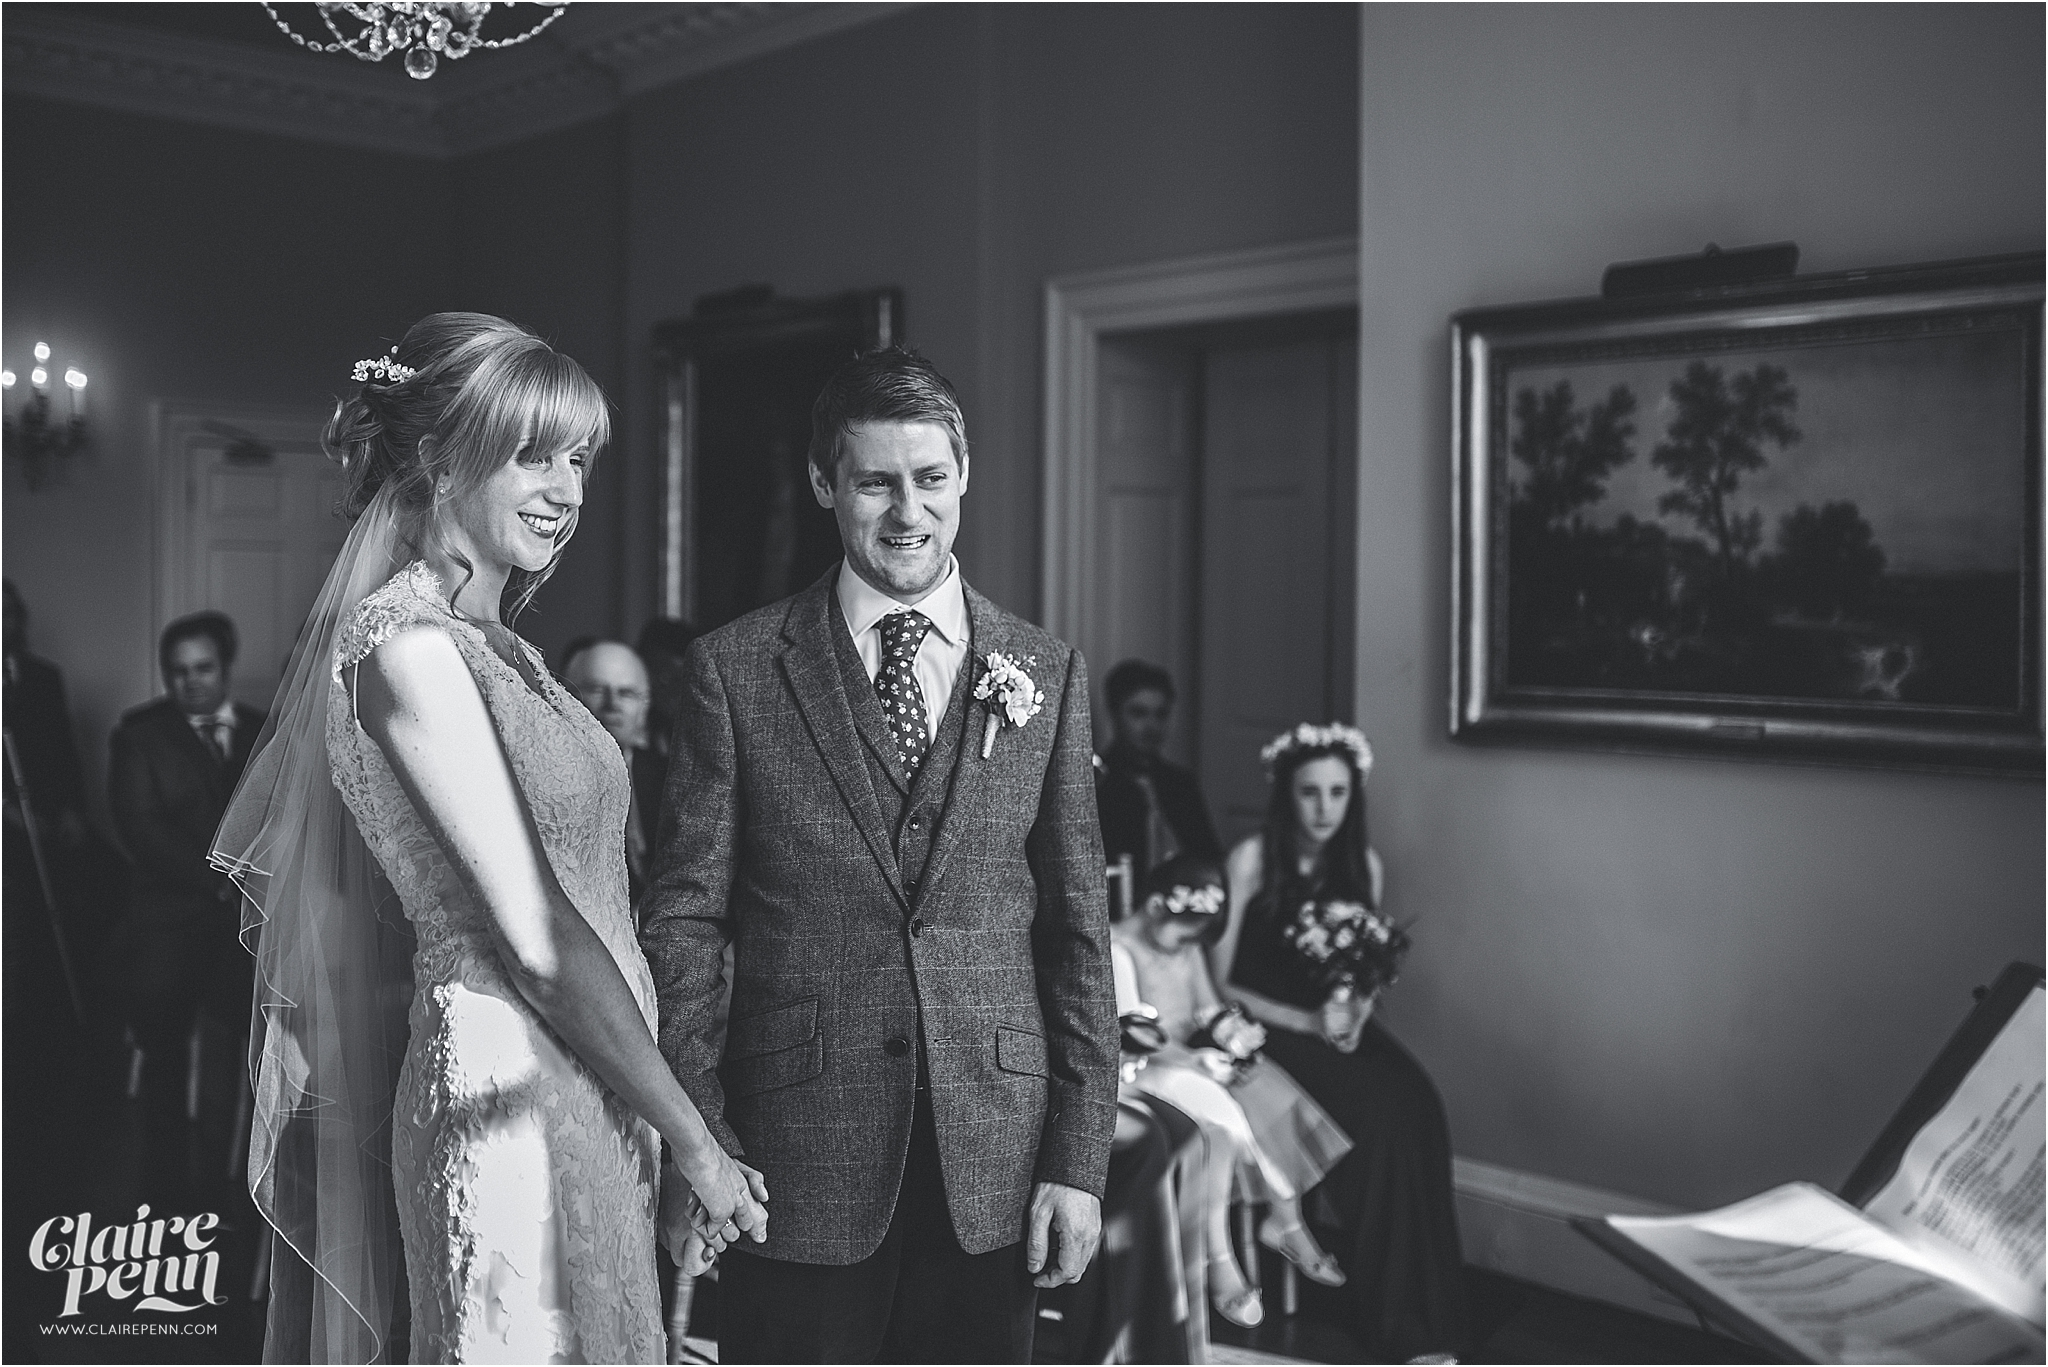 Iscoyd Park wedding, Whitchurch, Cheshire wedding photographer_0018.jpg